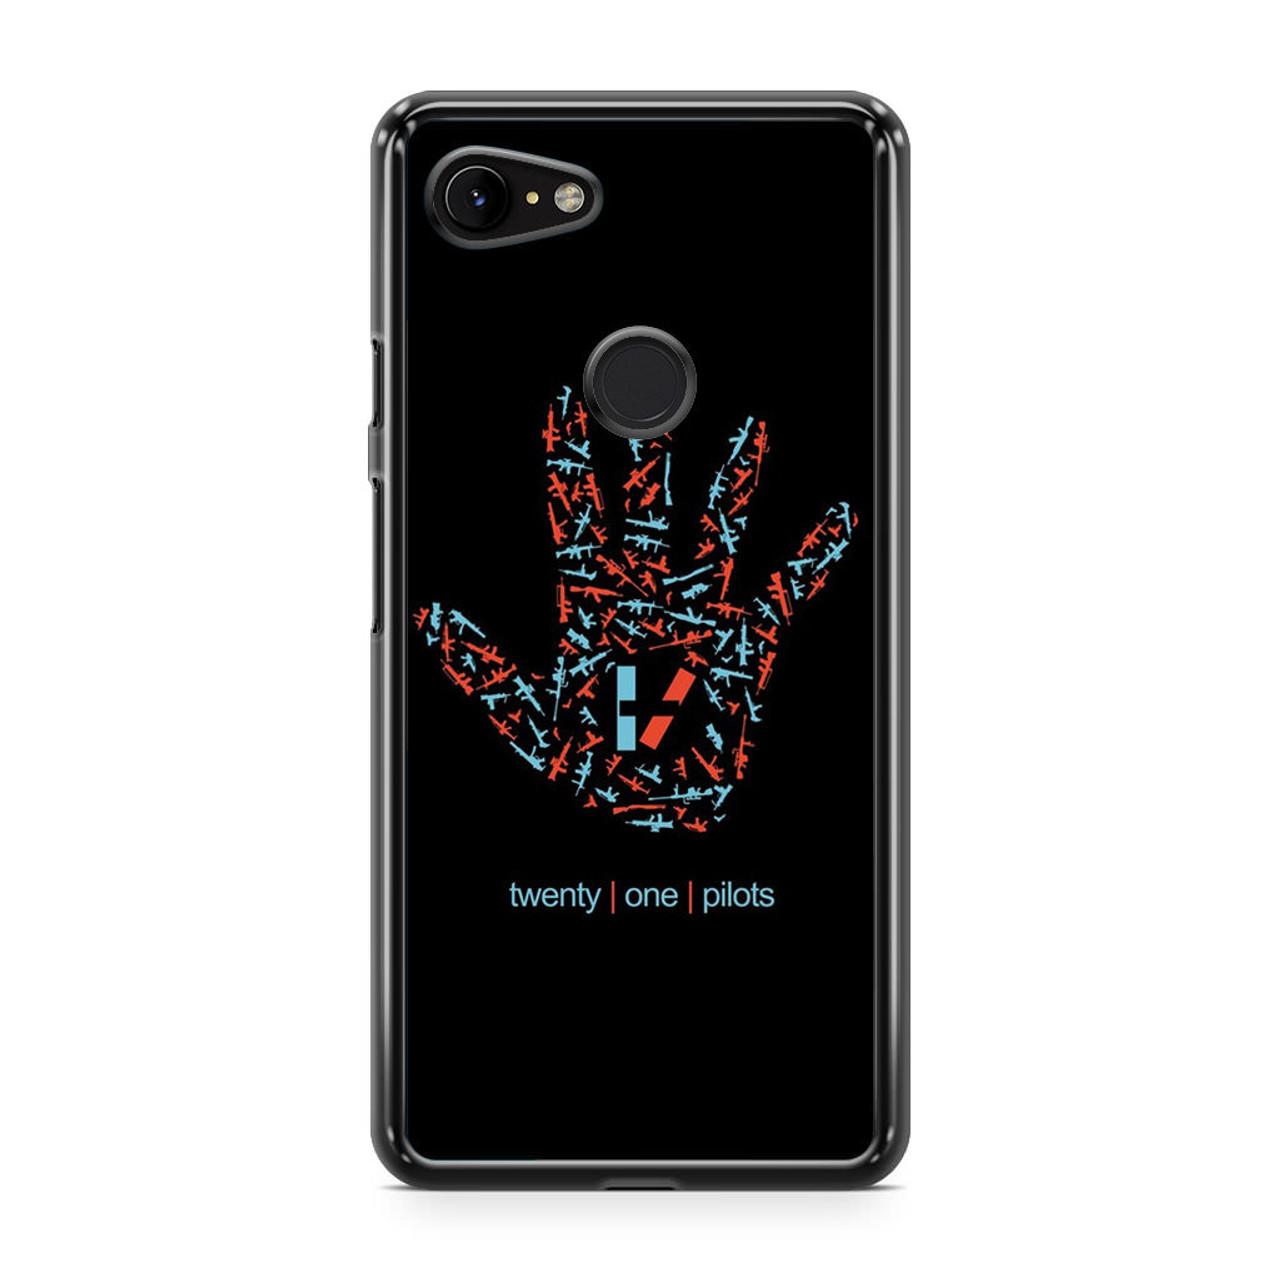 new product 85721 df06b Twenty One Pilots Original Google Pixel 3 XL Case - CASESHUNTER